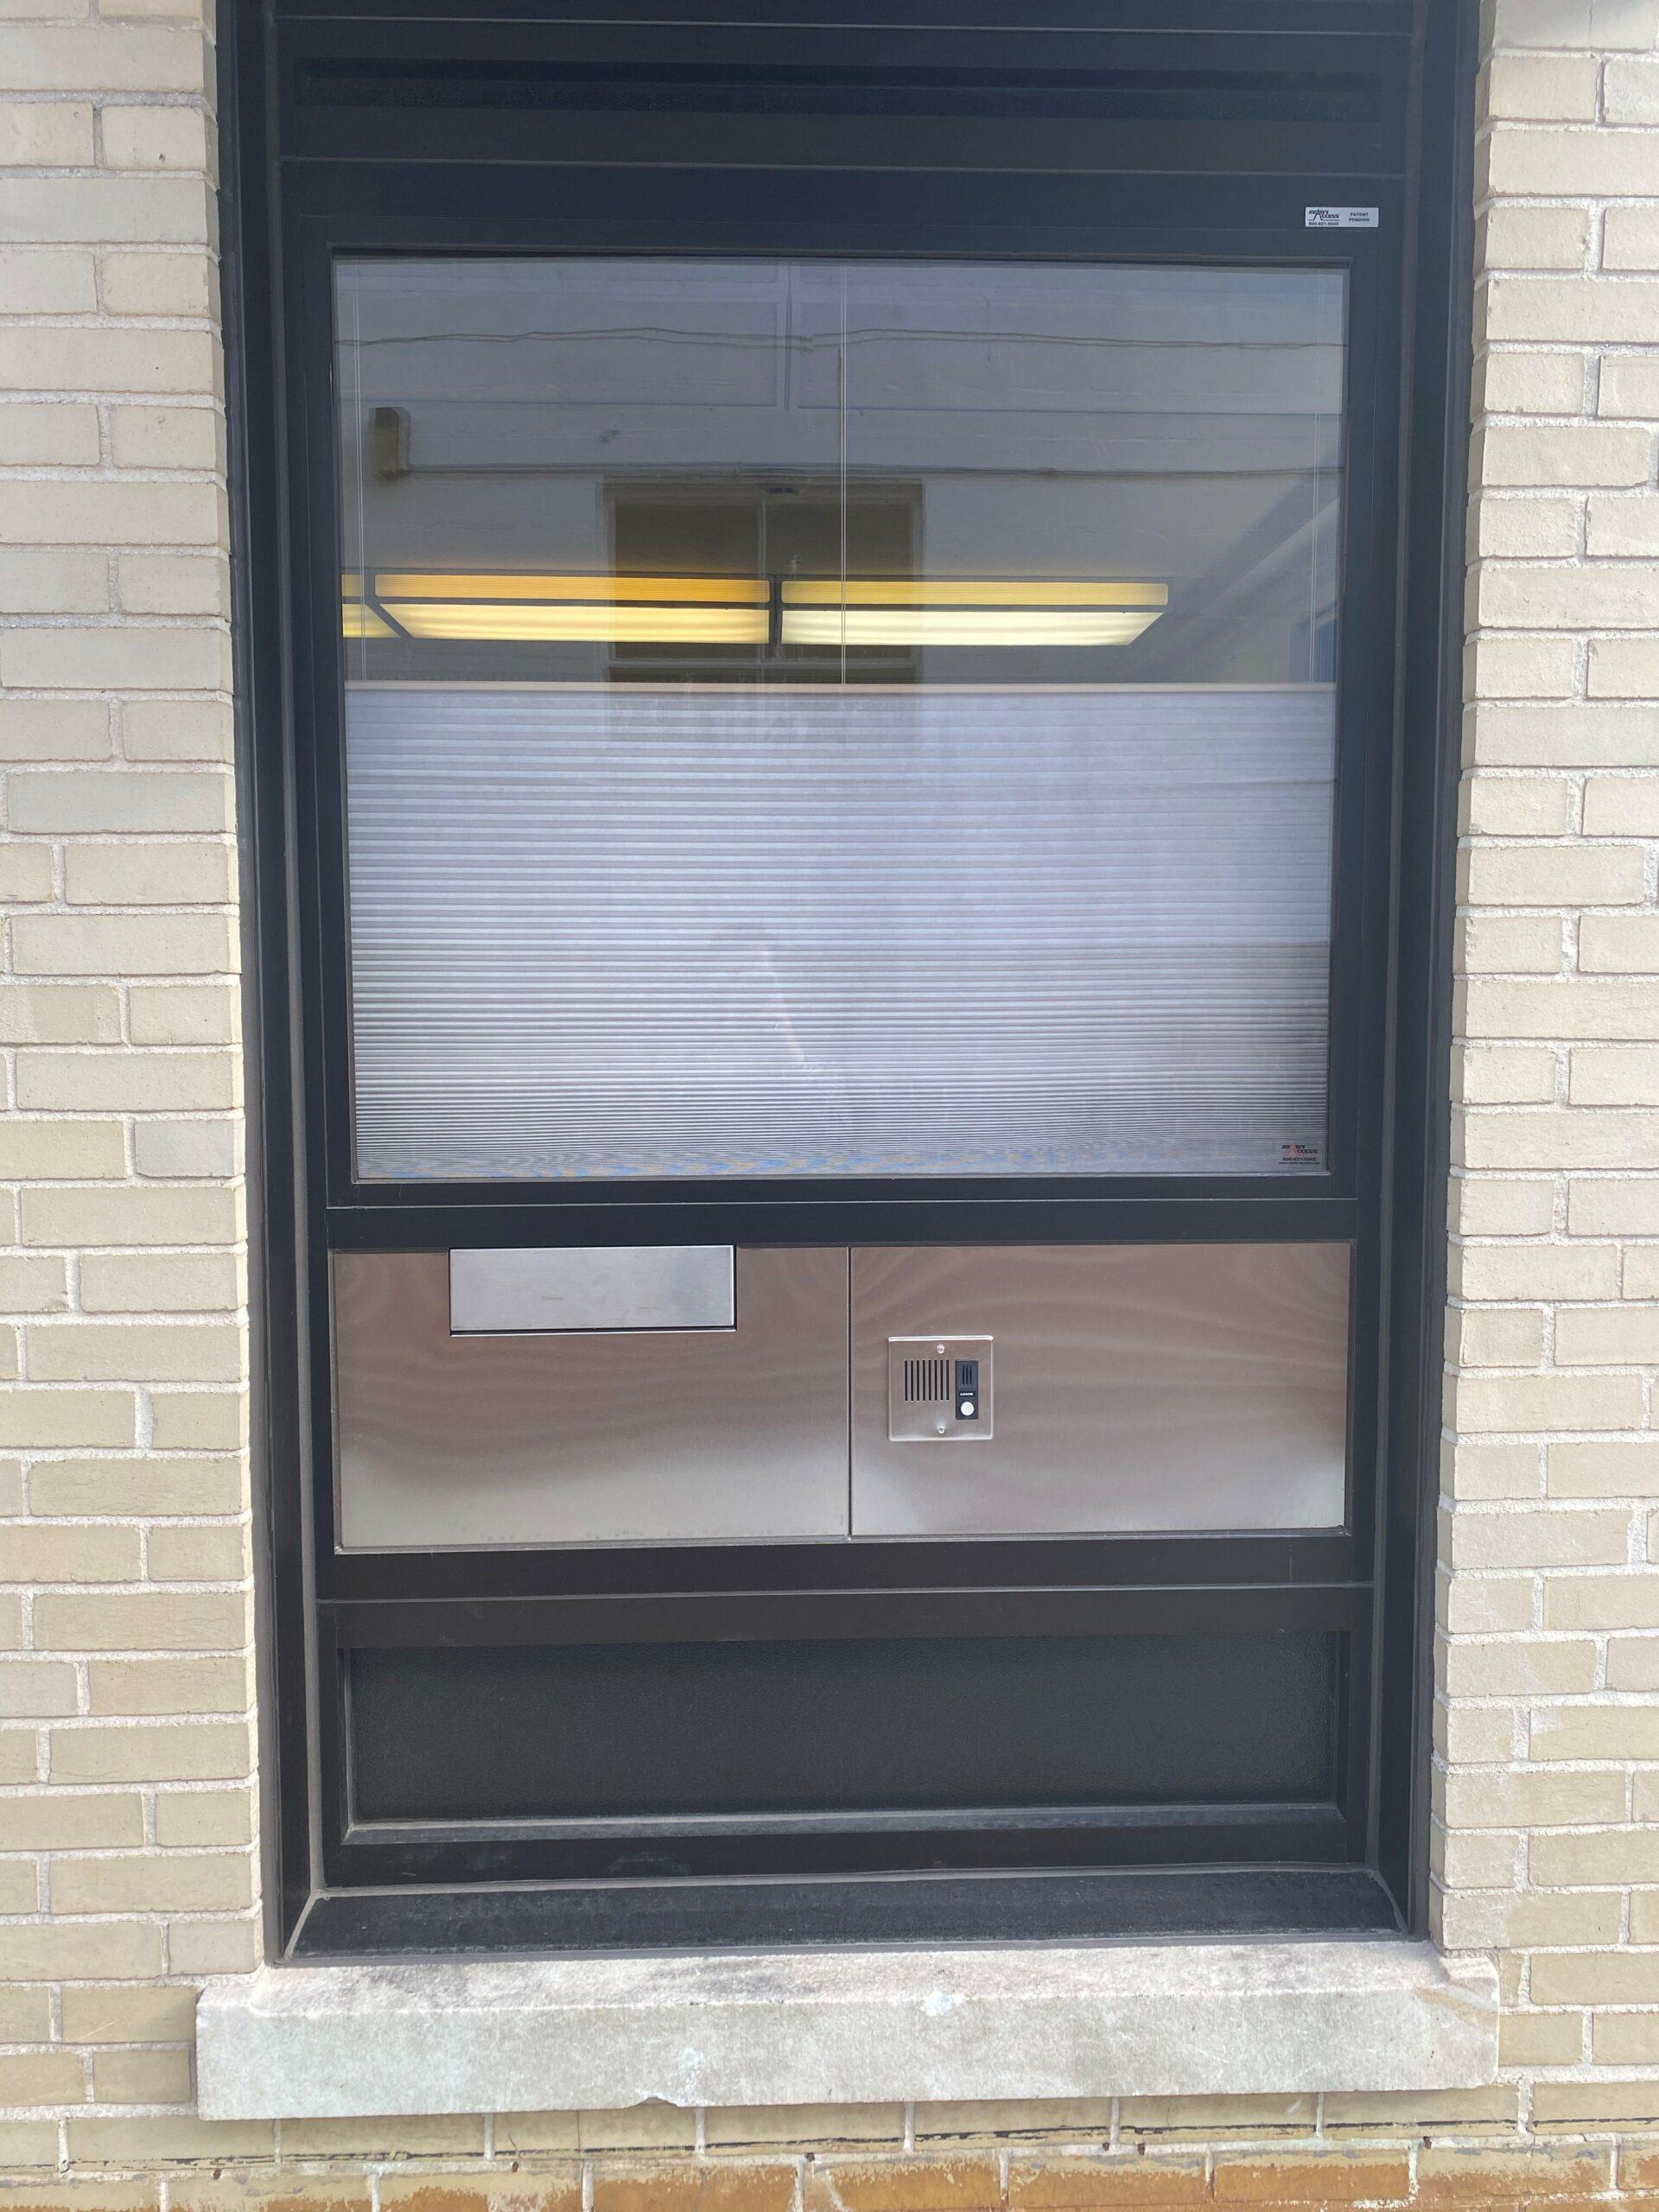 Customer Service Window 2 12022020